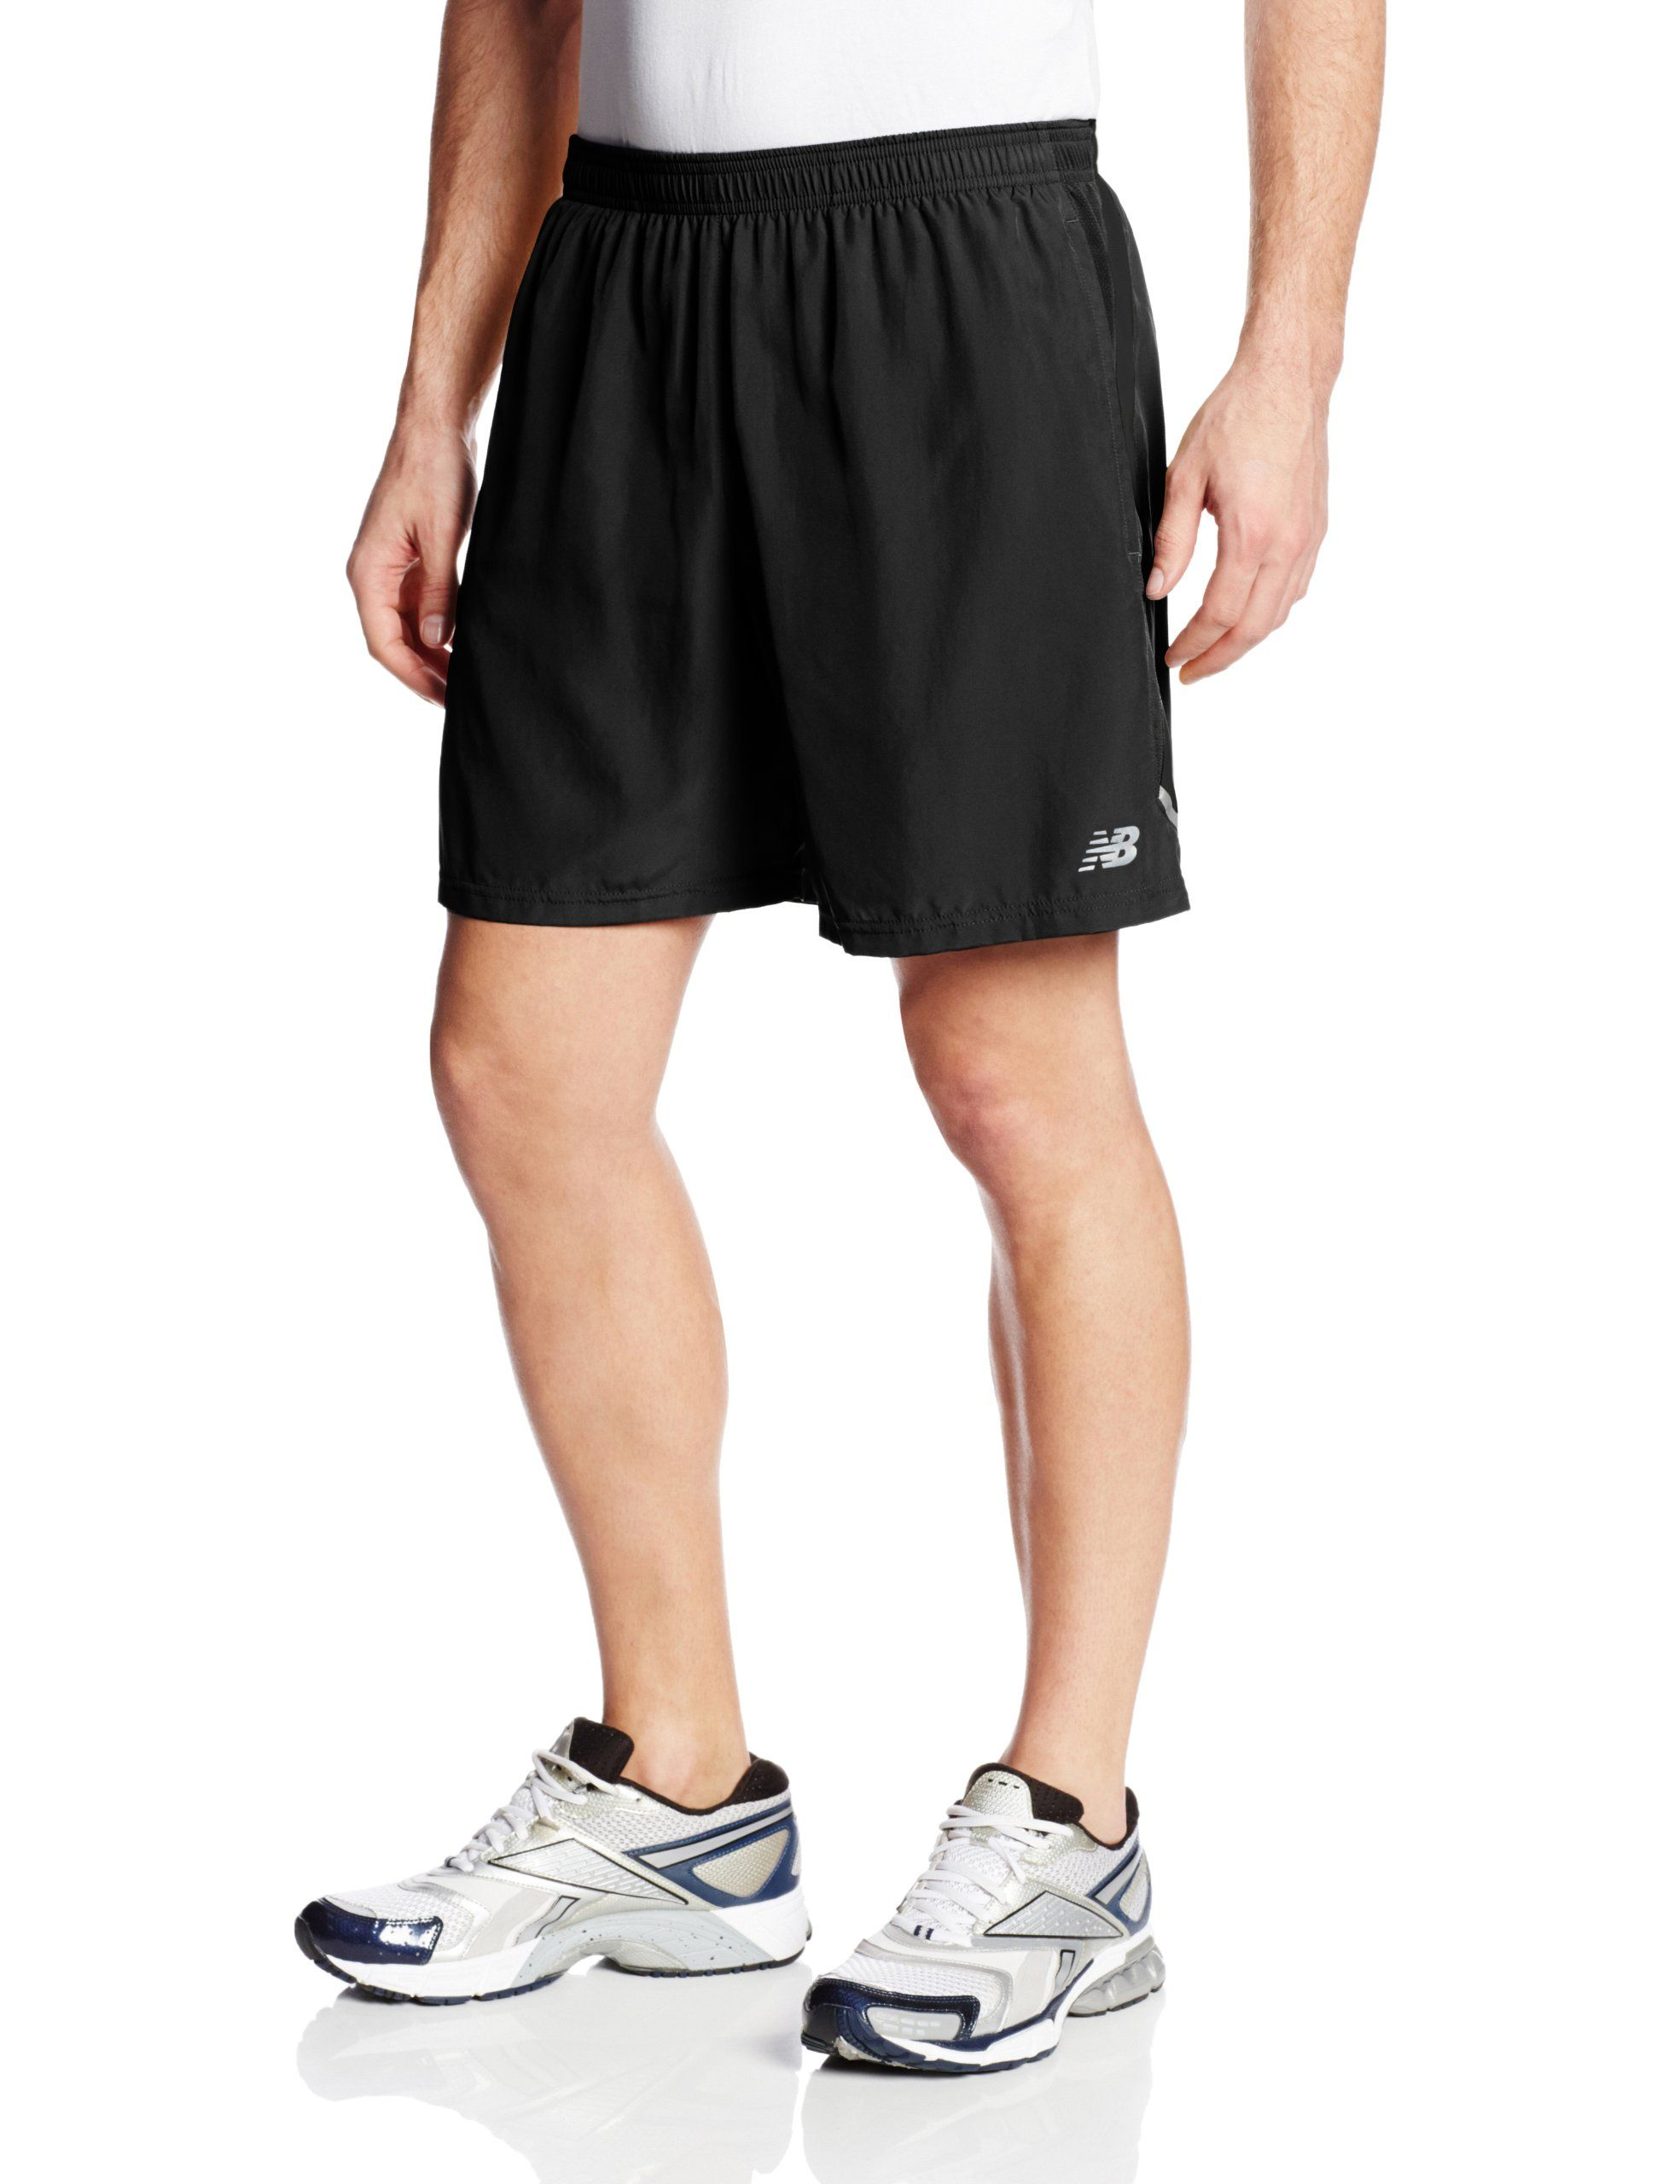 New Balance Men's 7-Inch Go 2 Shorts, Black, Small. Internal Brief